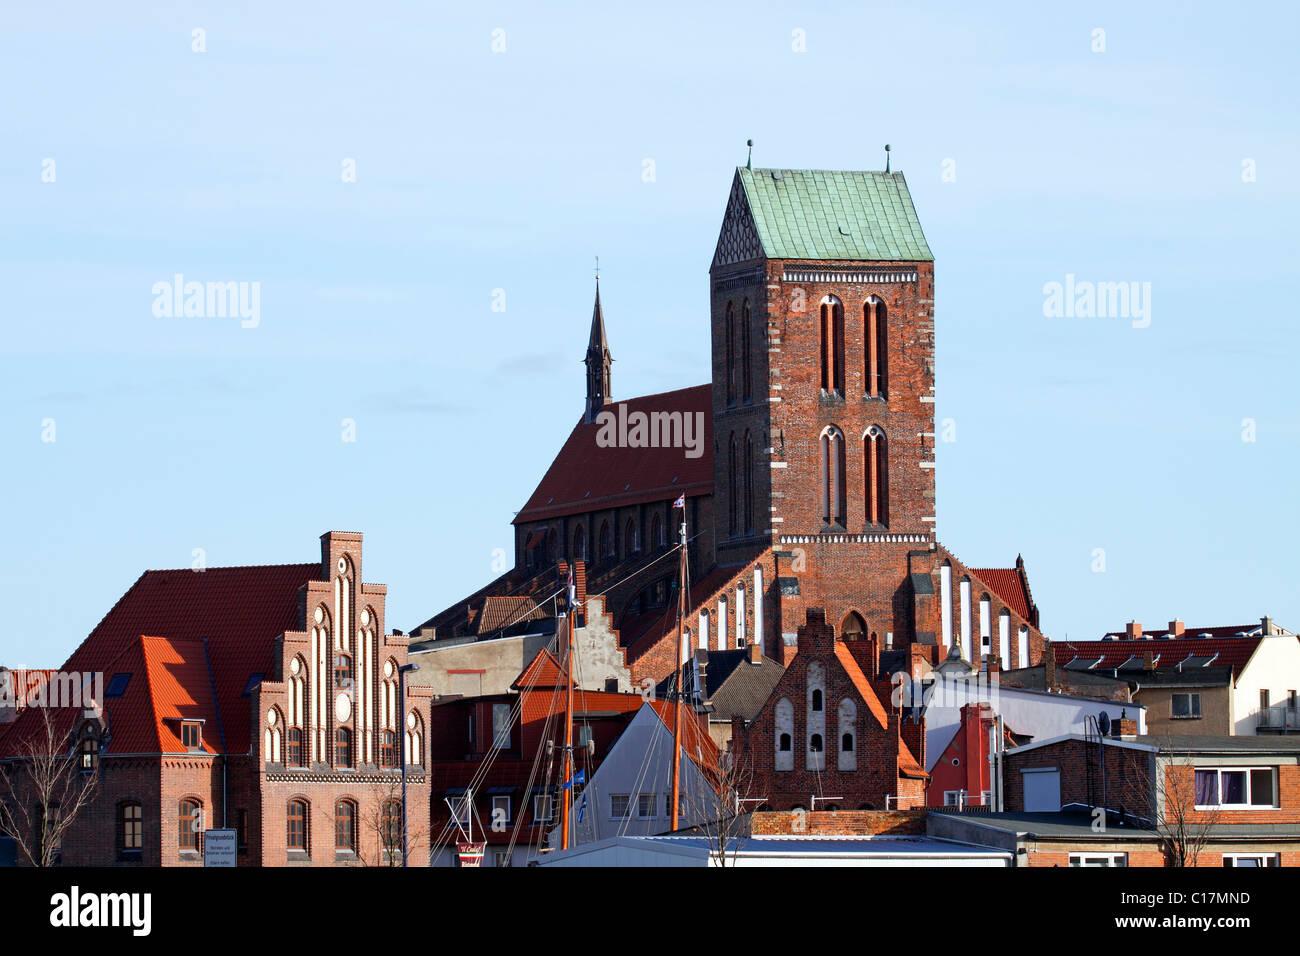 Historic St. Nikolai Church in the Old Town of Wismar, UNESCO World Heritage Site, Mecklenburg-Western Pomerania - Stock Image